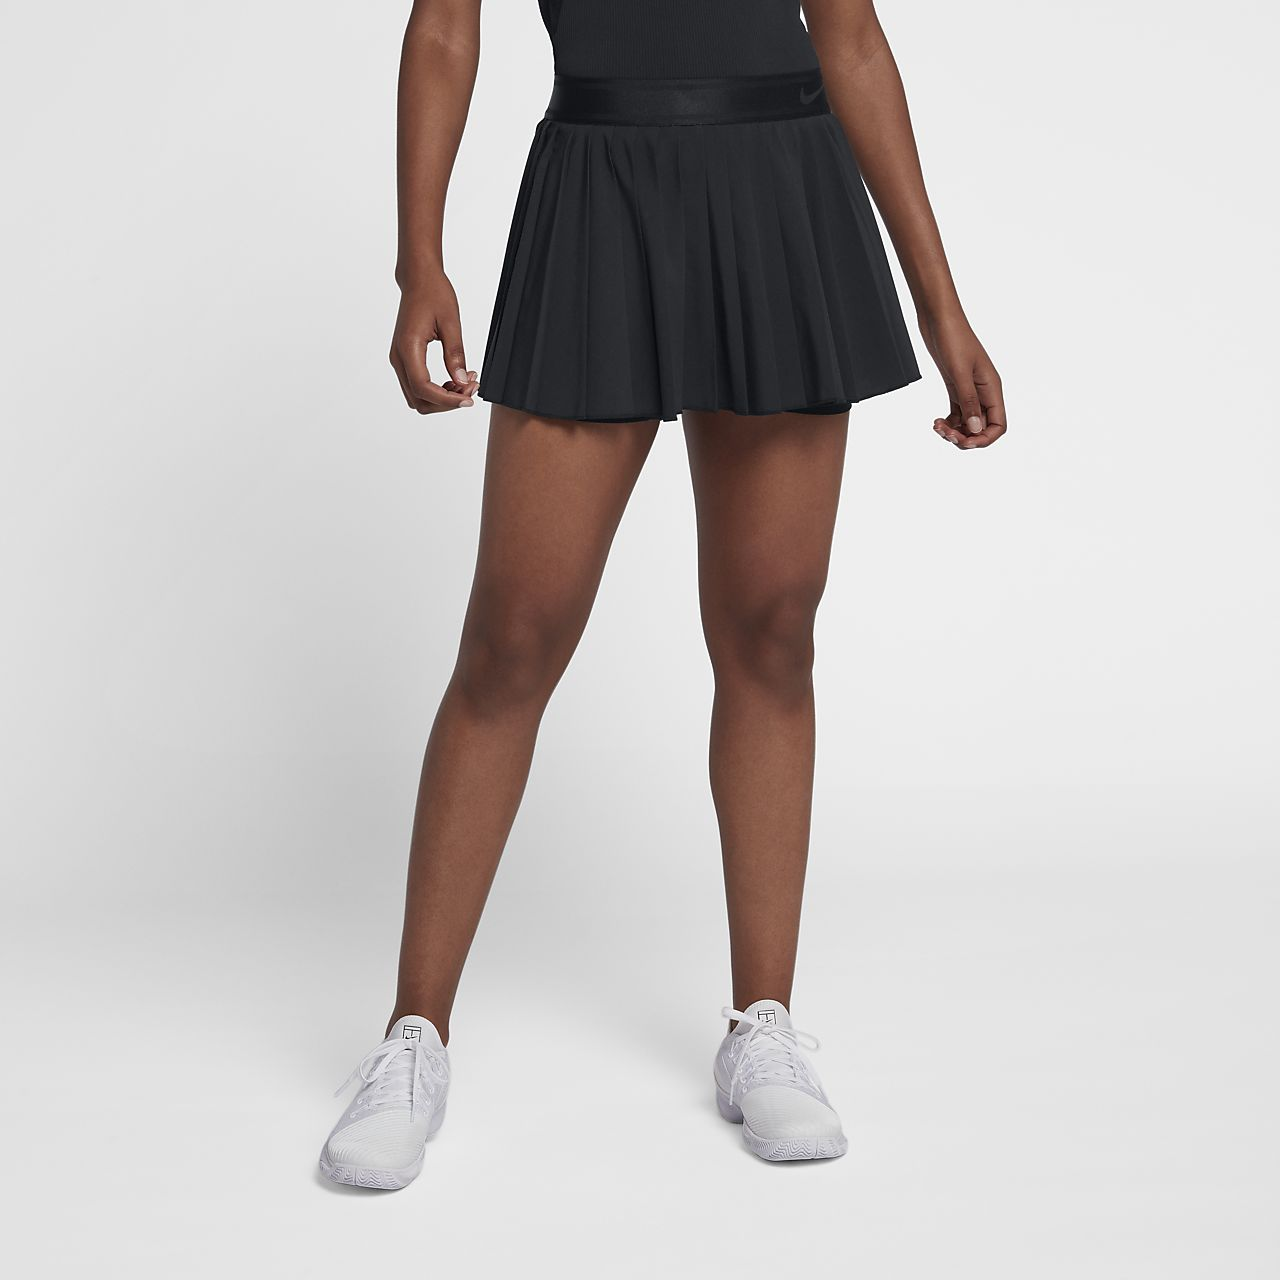 8234723731d NikeCourt Victory Women s Tennis Skirt. Nike.com